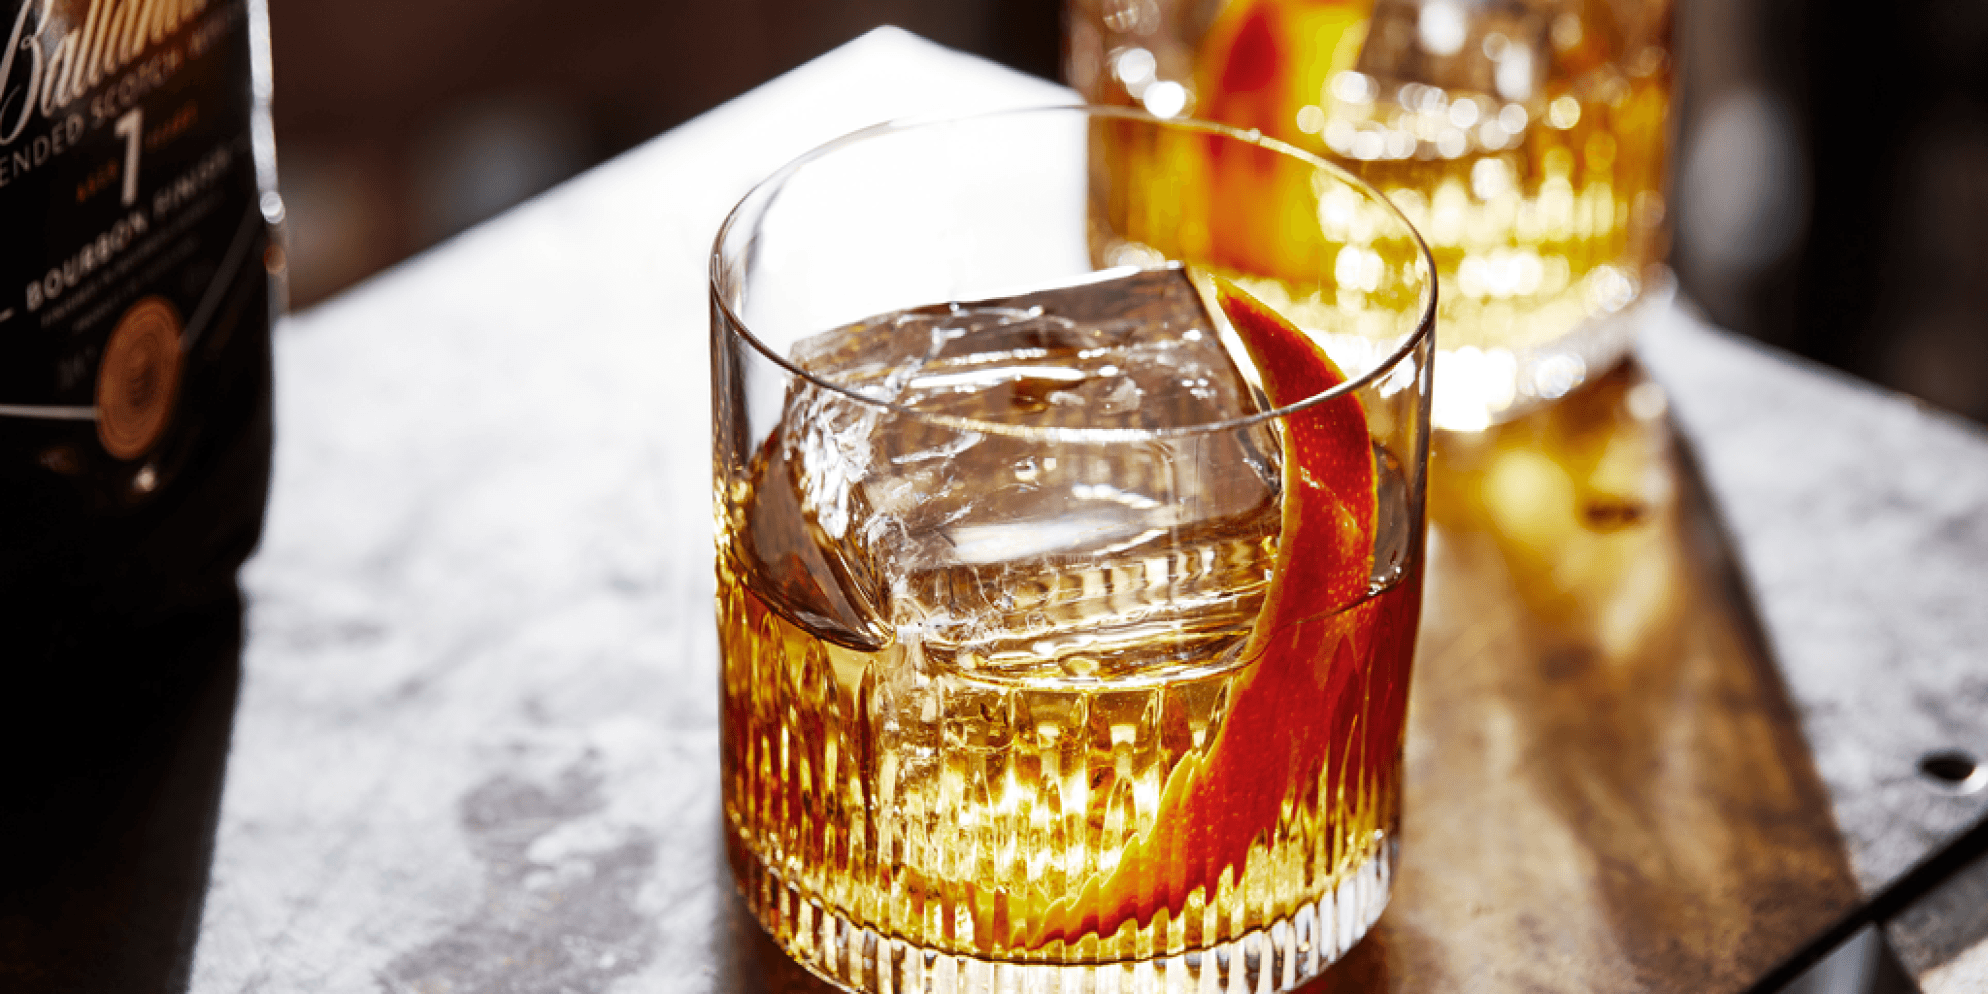 Old fashioned avec B7 Bourbon Finish